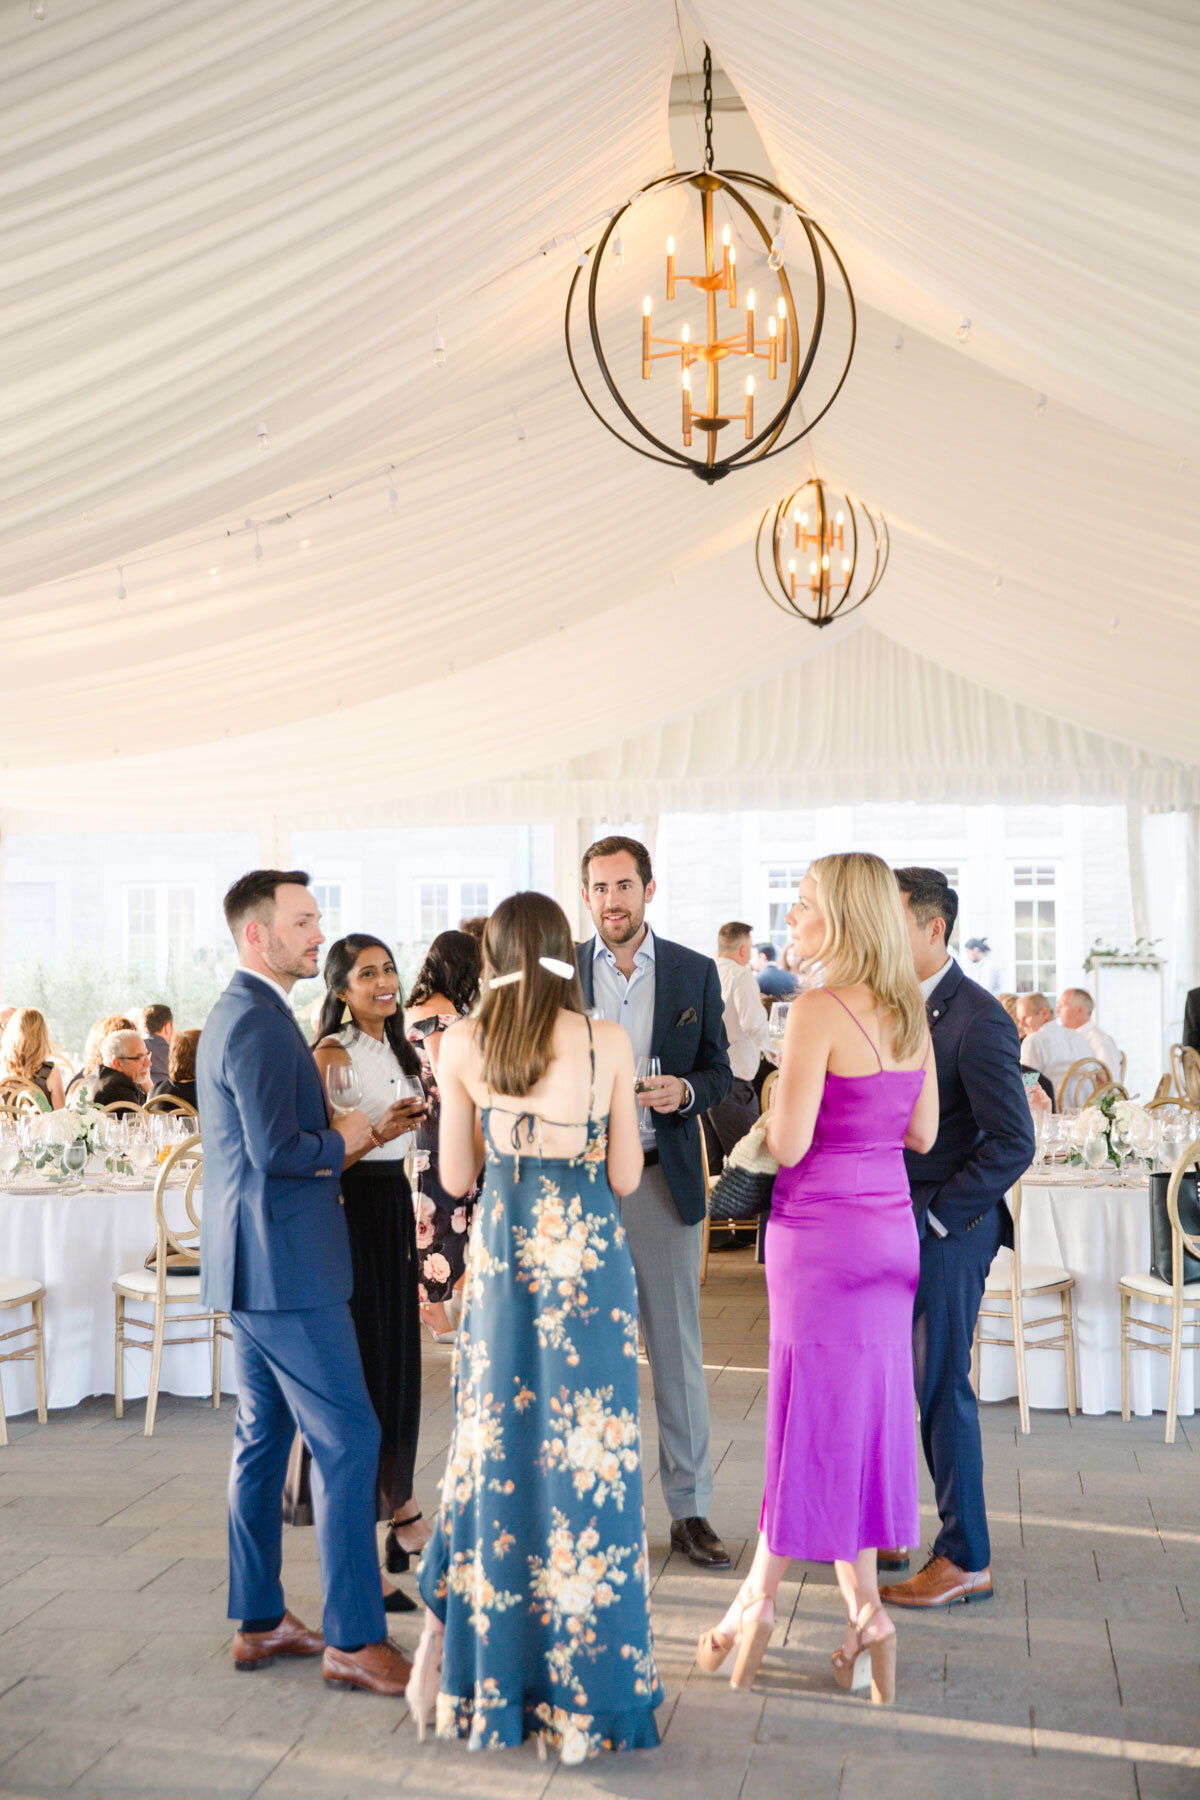 Chateau-des-Charmes-Wedding-Summer-Vineyard-Bride-Niagara-on-the-Lake-photos-by-Gemini-Photography-Ontario-0070.jpg